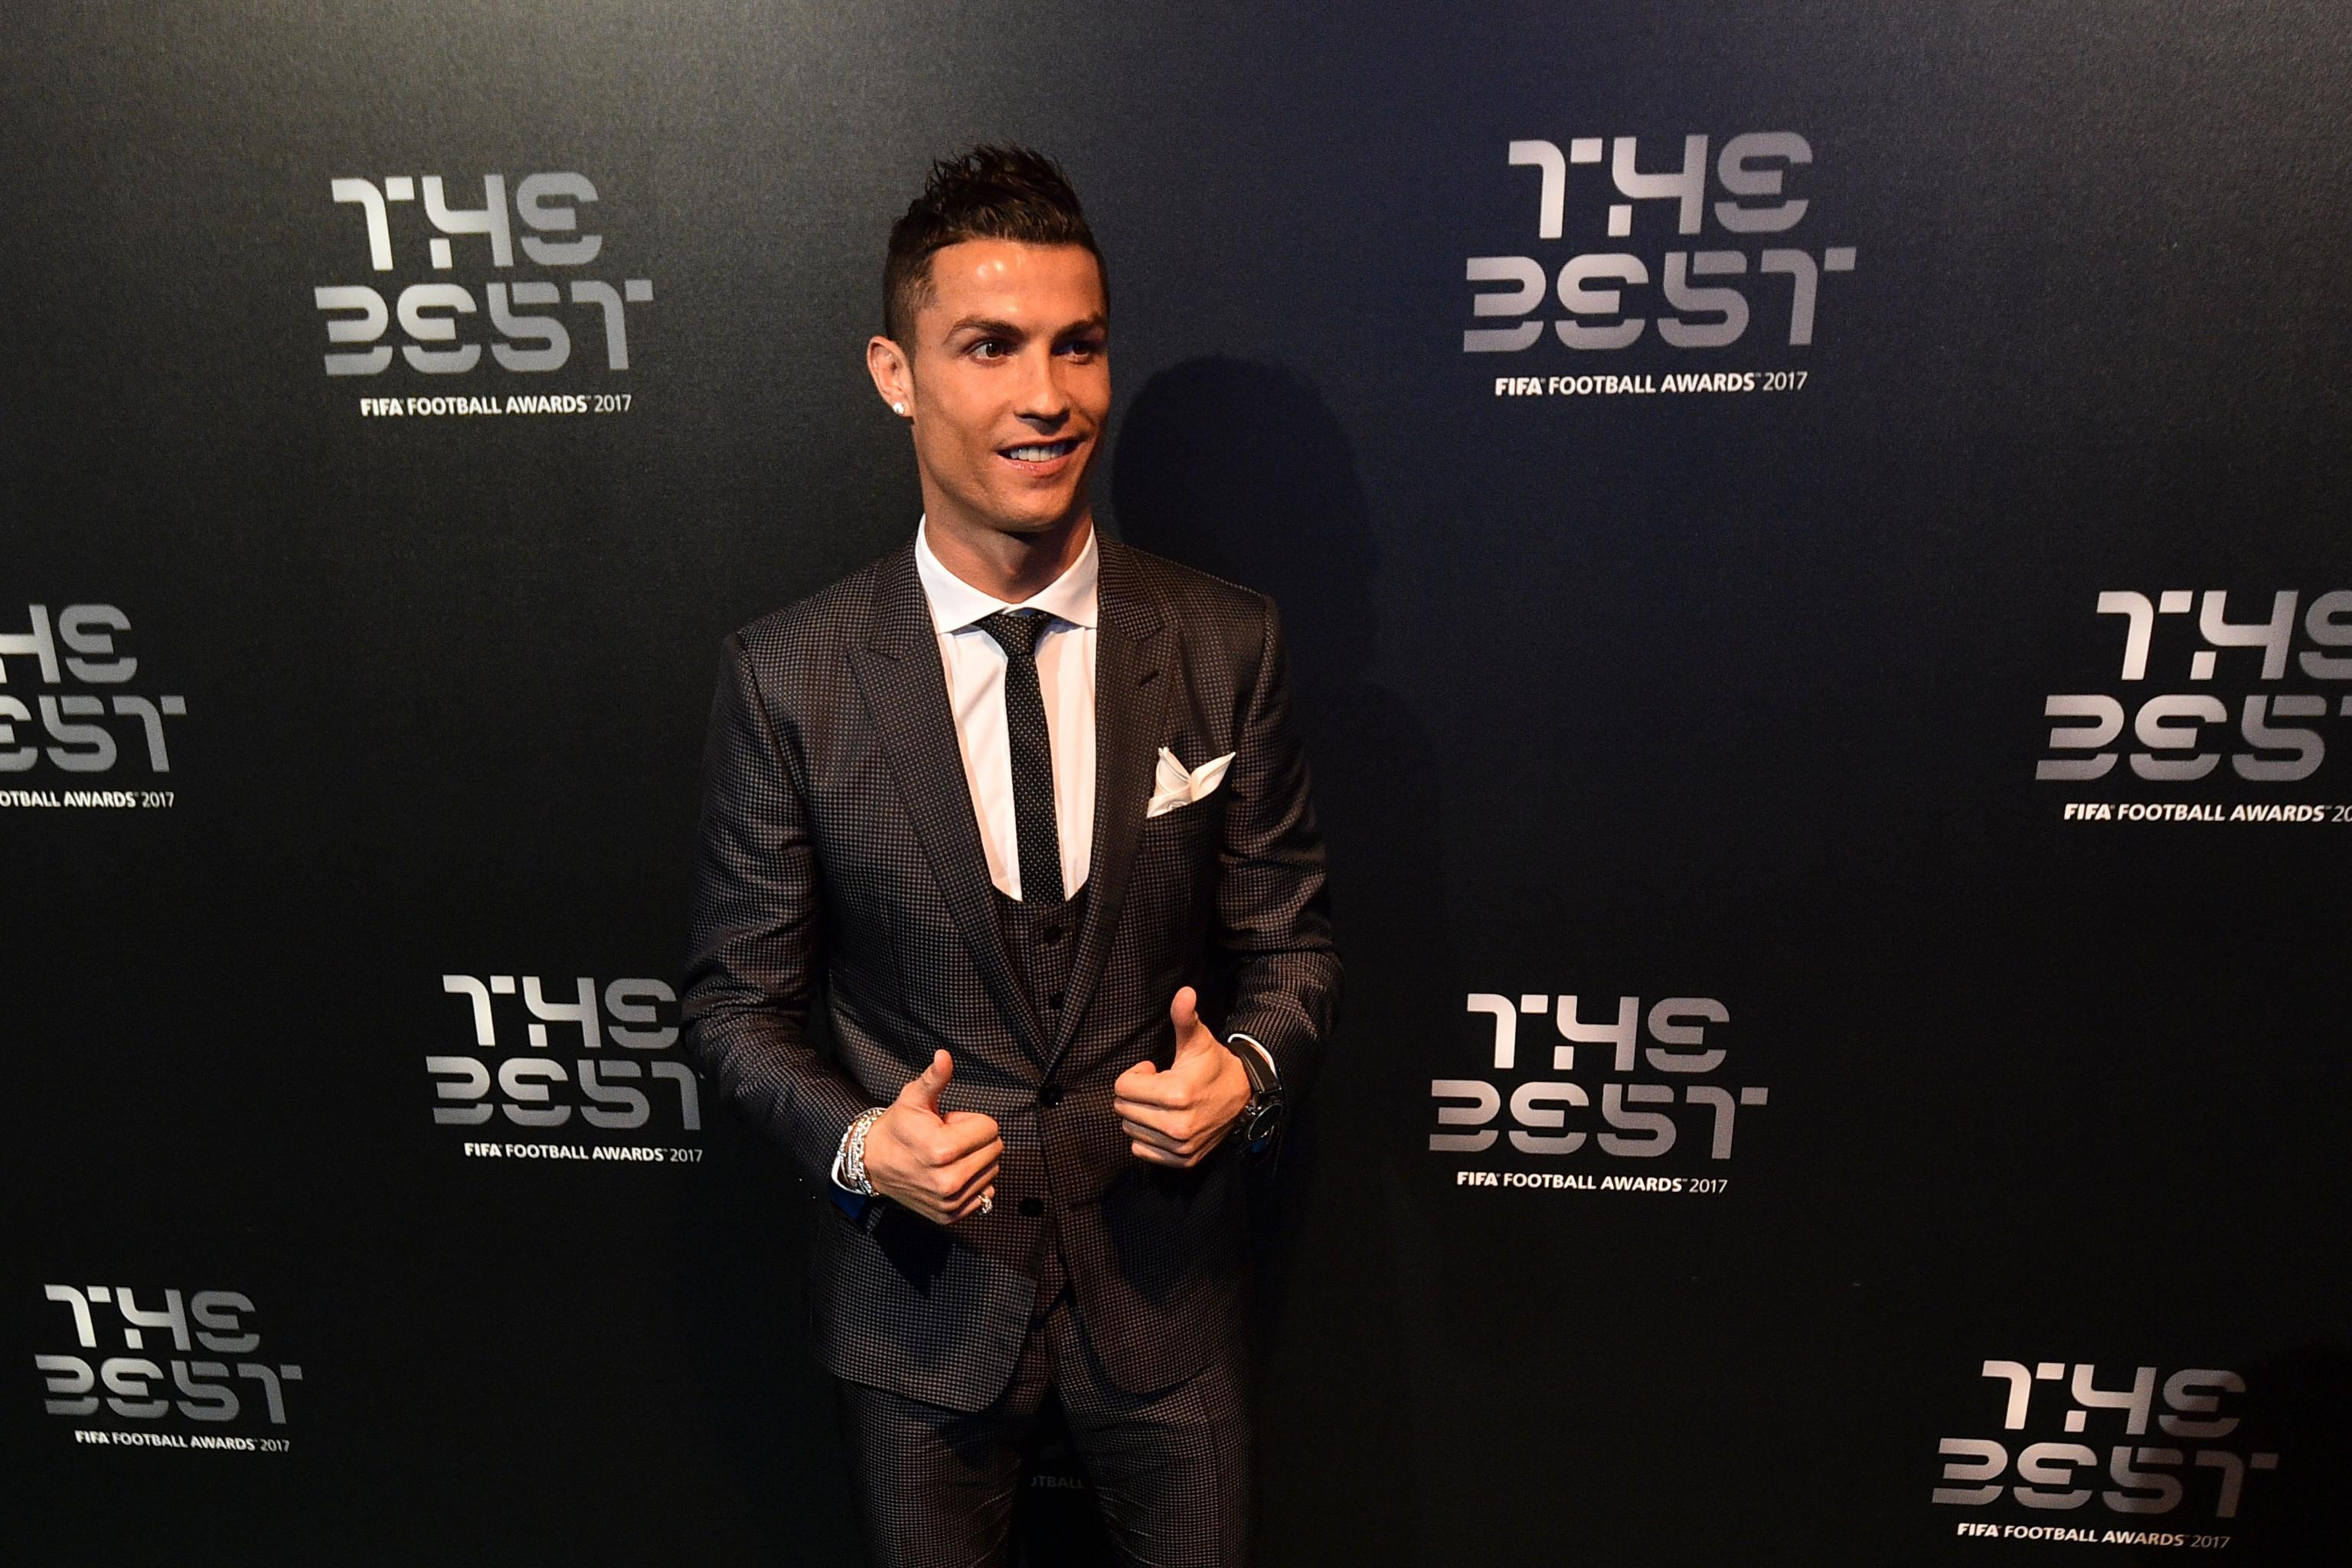 Fifa Best Men S Player 2017 Cristiano Ronaldo Wins Over Lionel Messi Neymar Bleacher Report Latest News Videos And Highlights